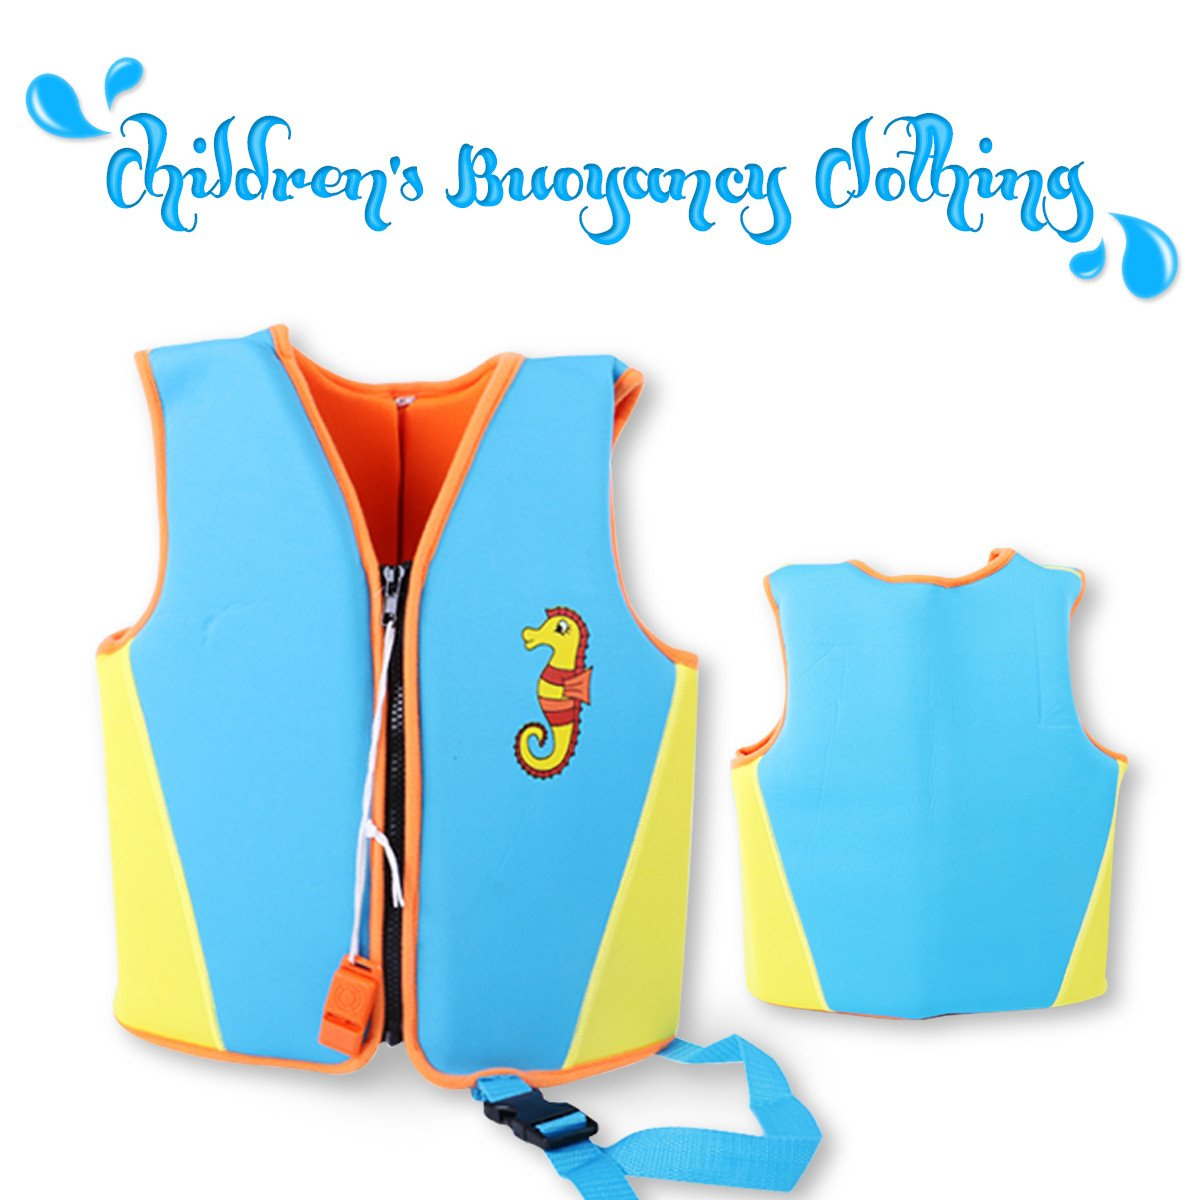 SymbolLife Kids SwimトレーナーベストプールFloatsネオプレンライフベスト子浮力衣類、水泳学習者保護ベスト Large ブルー B07D76YD1M